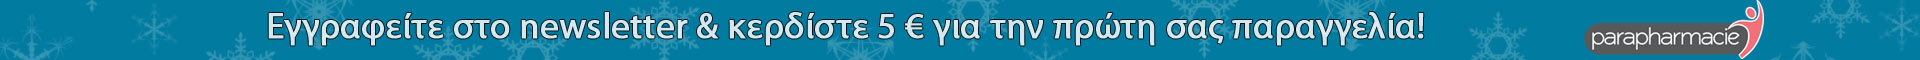 Parapharmacie cyprus Online shop